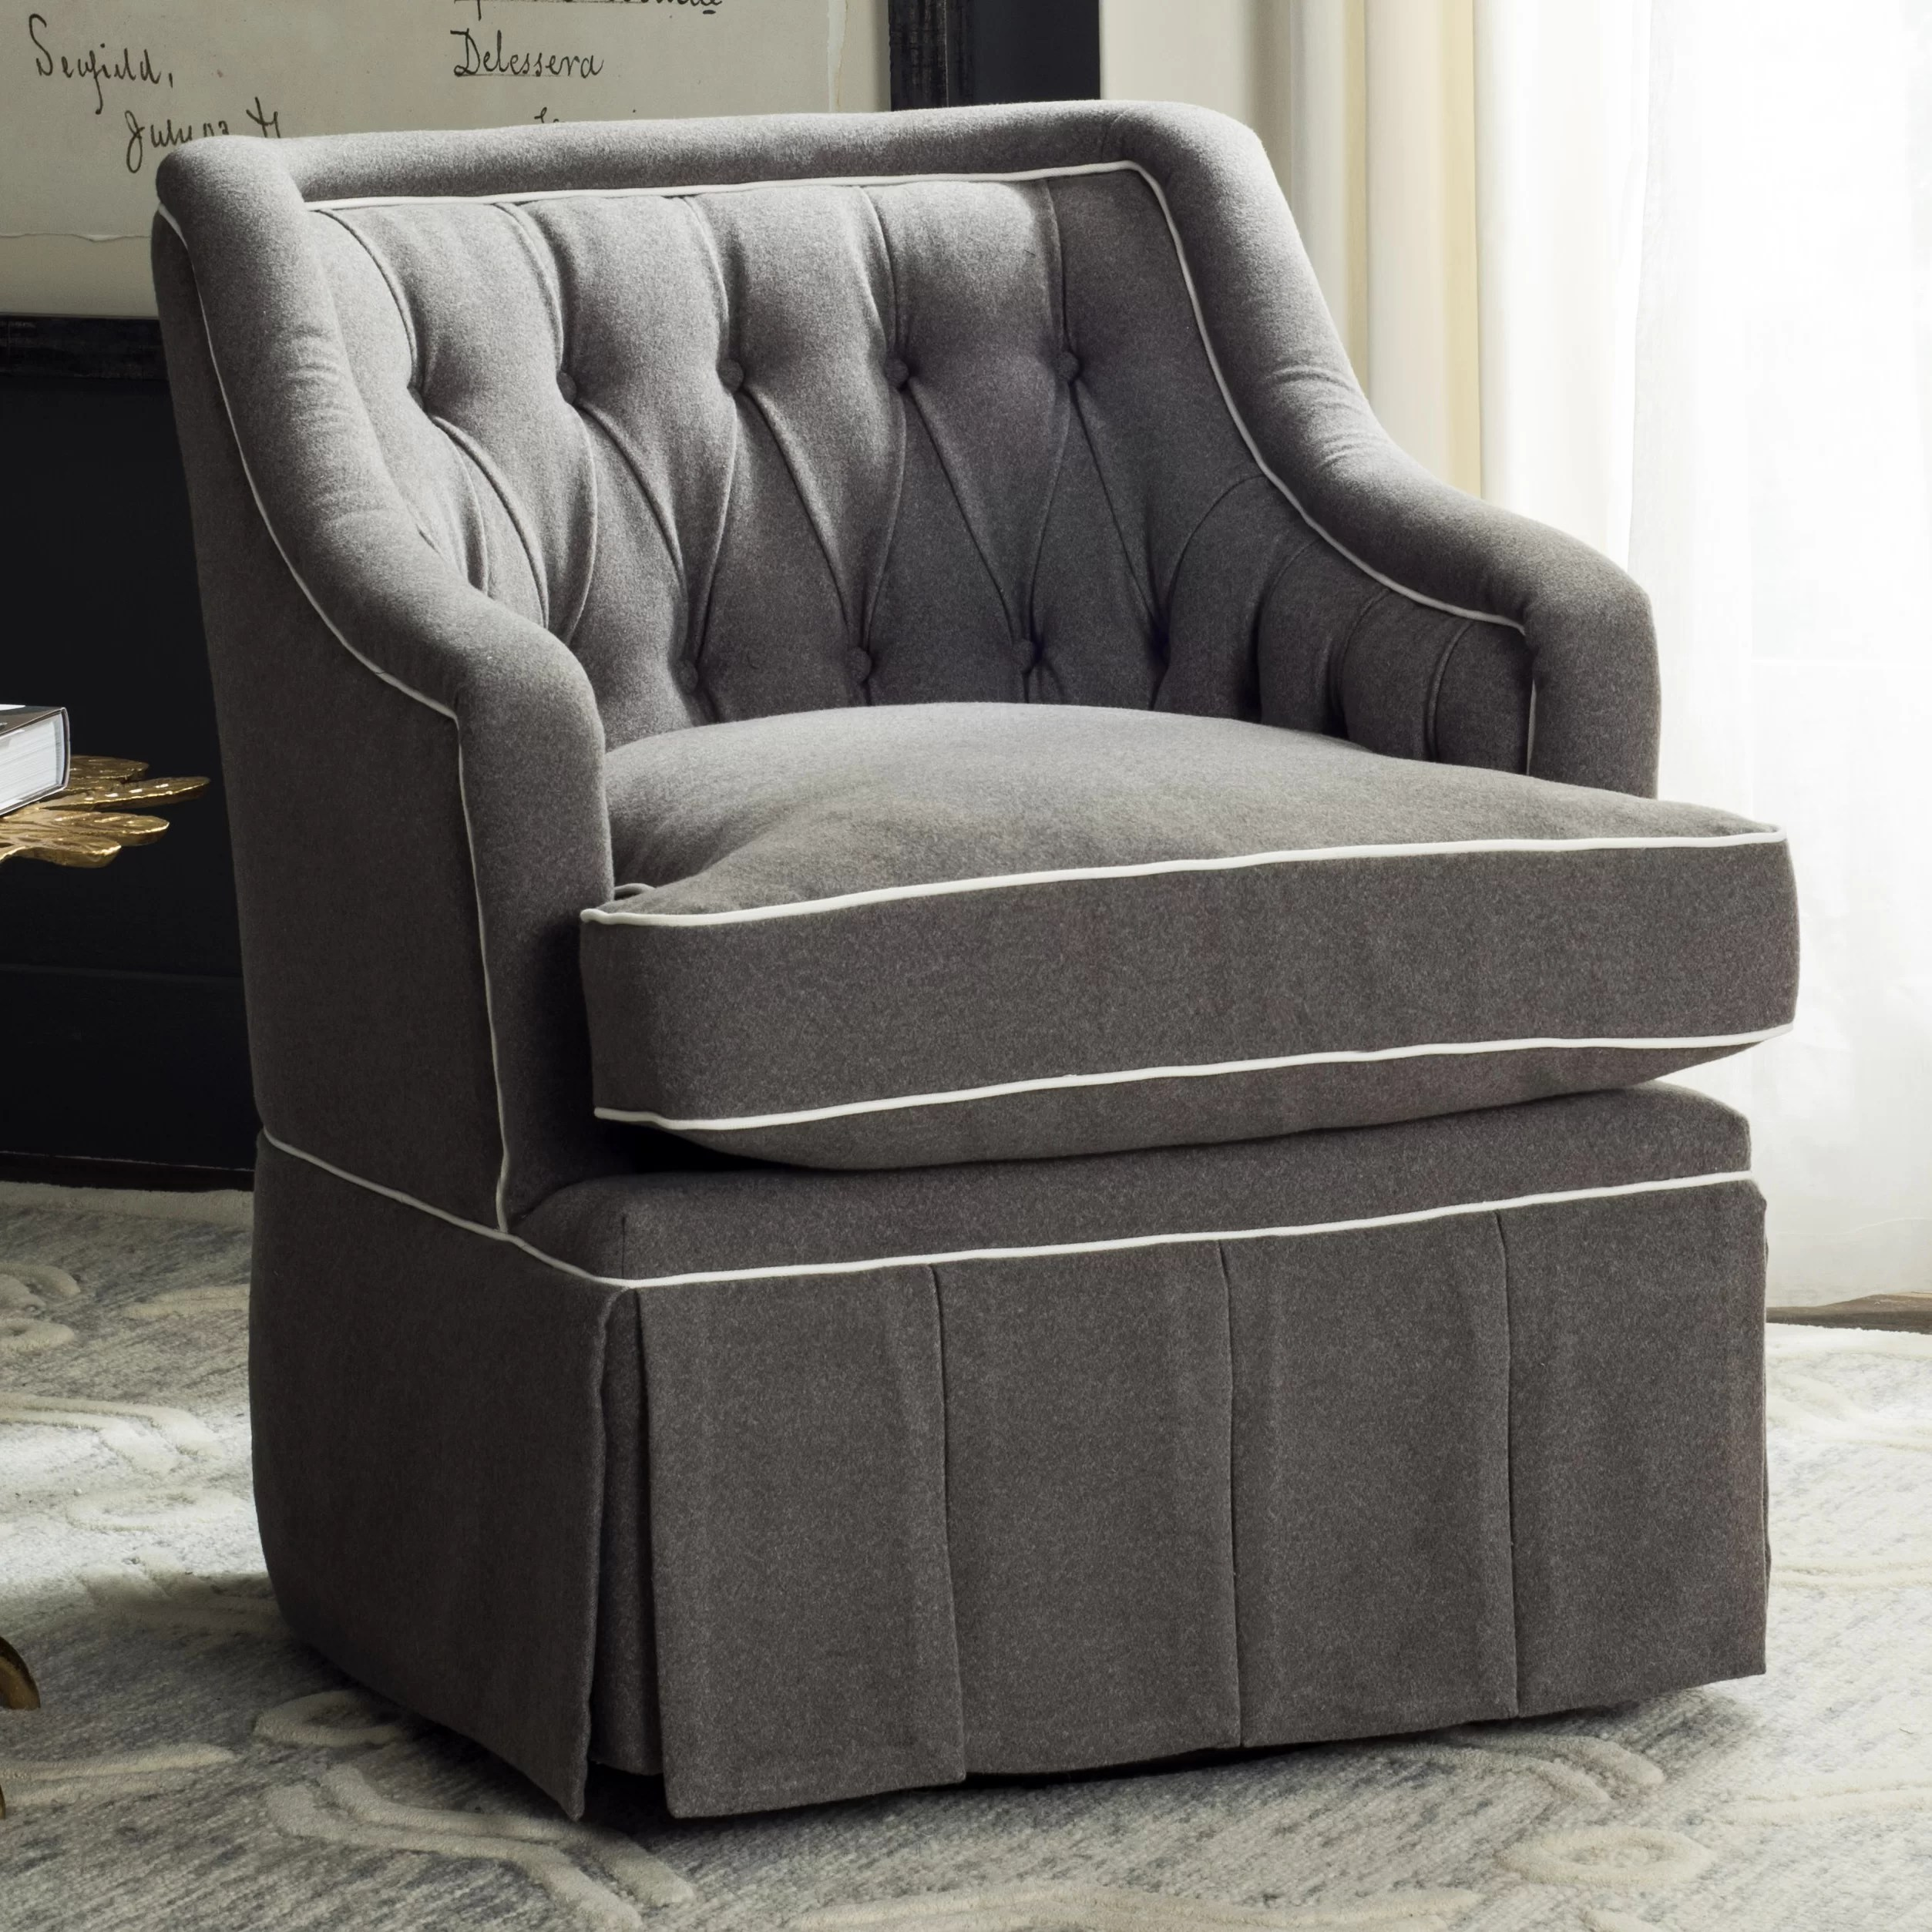 Darby Home Co Knepper Swivel Club Chair & Reviews